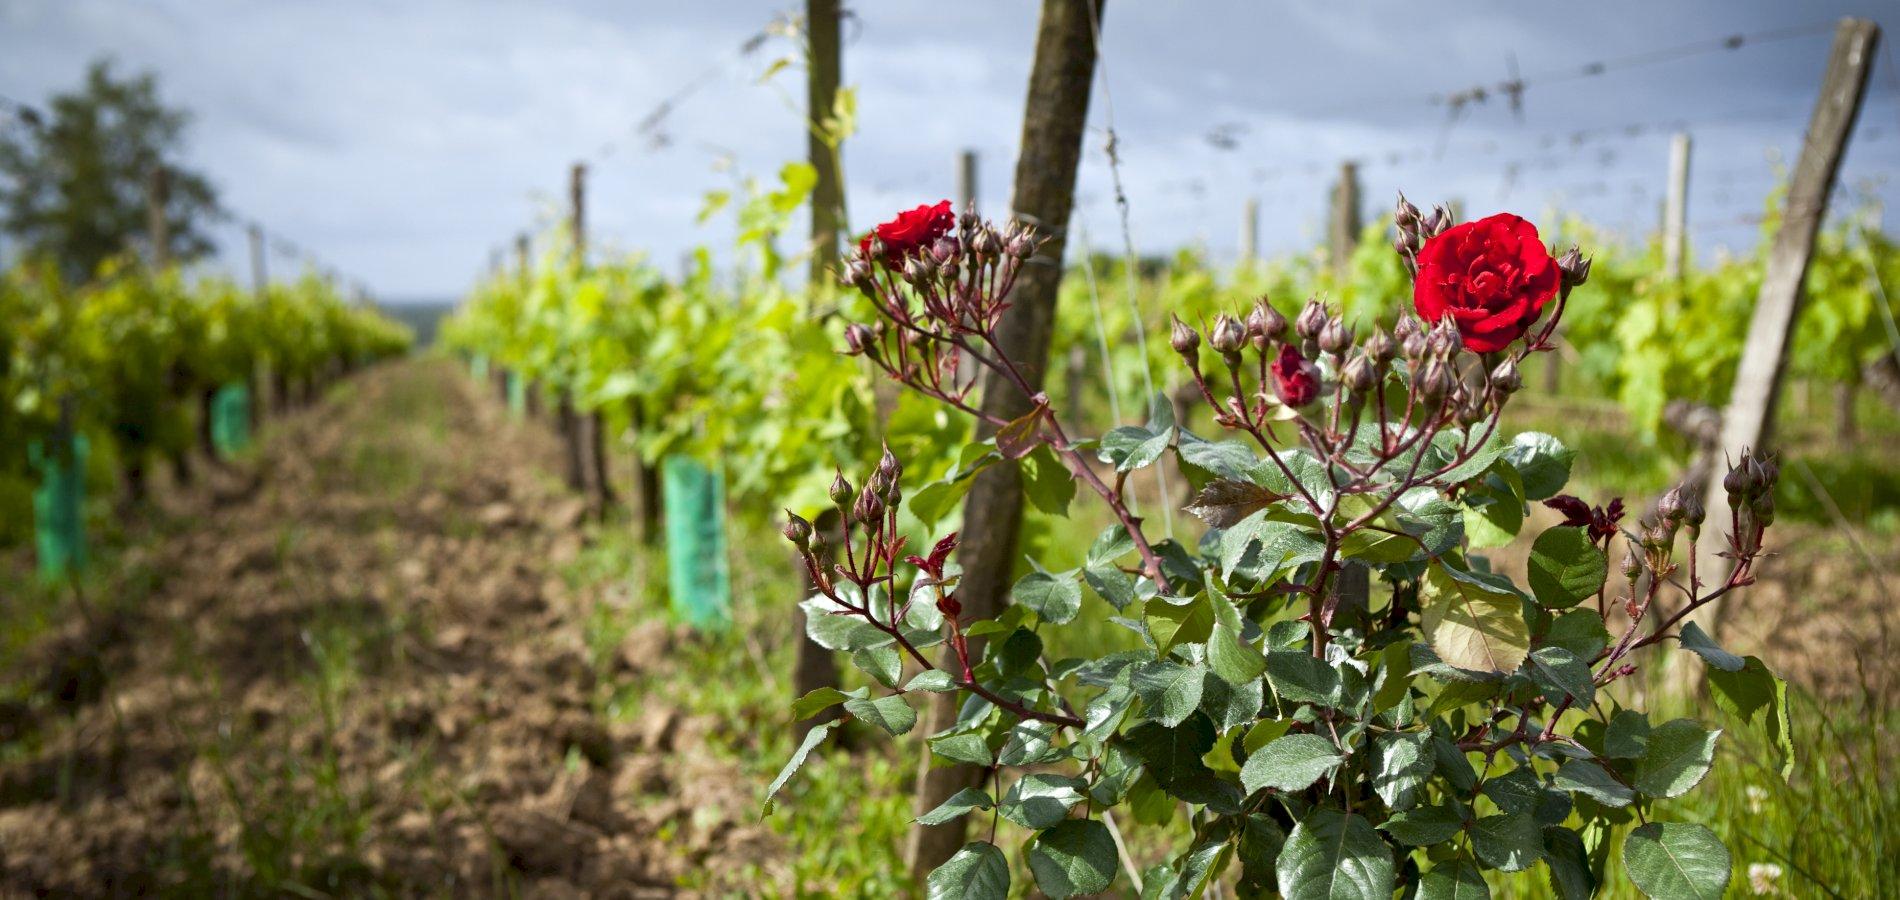 Ophorus Tours - Saint Emilion Wine Tour Shared Full Day Trip From Bordeaux